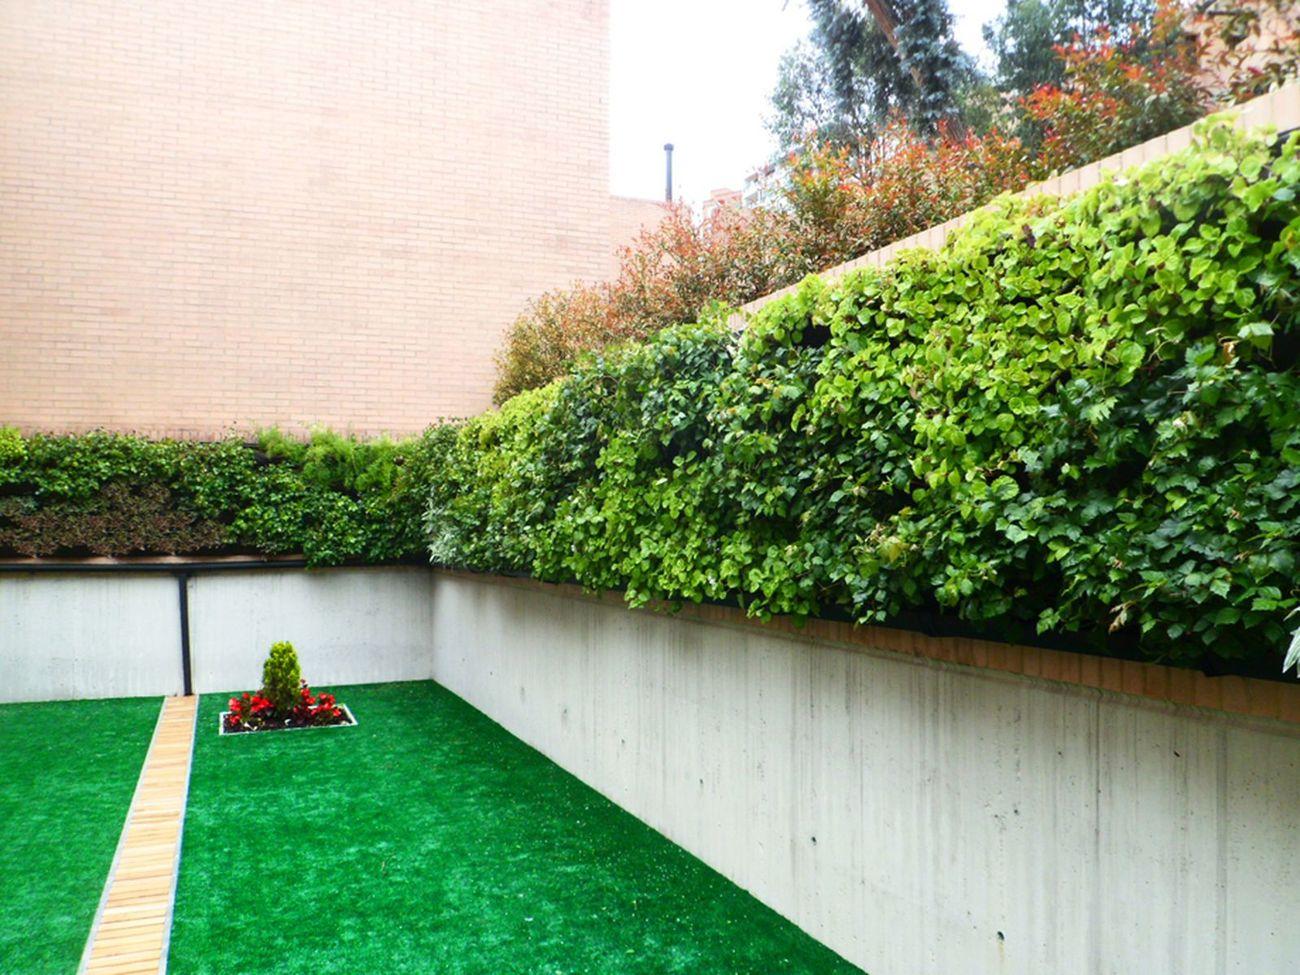 Muro verde artificial finest como un tipo de muro verde for Materiales para un muro verde